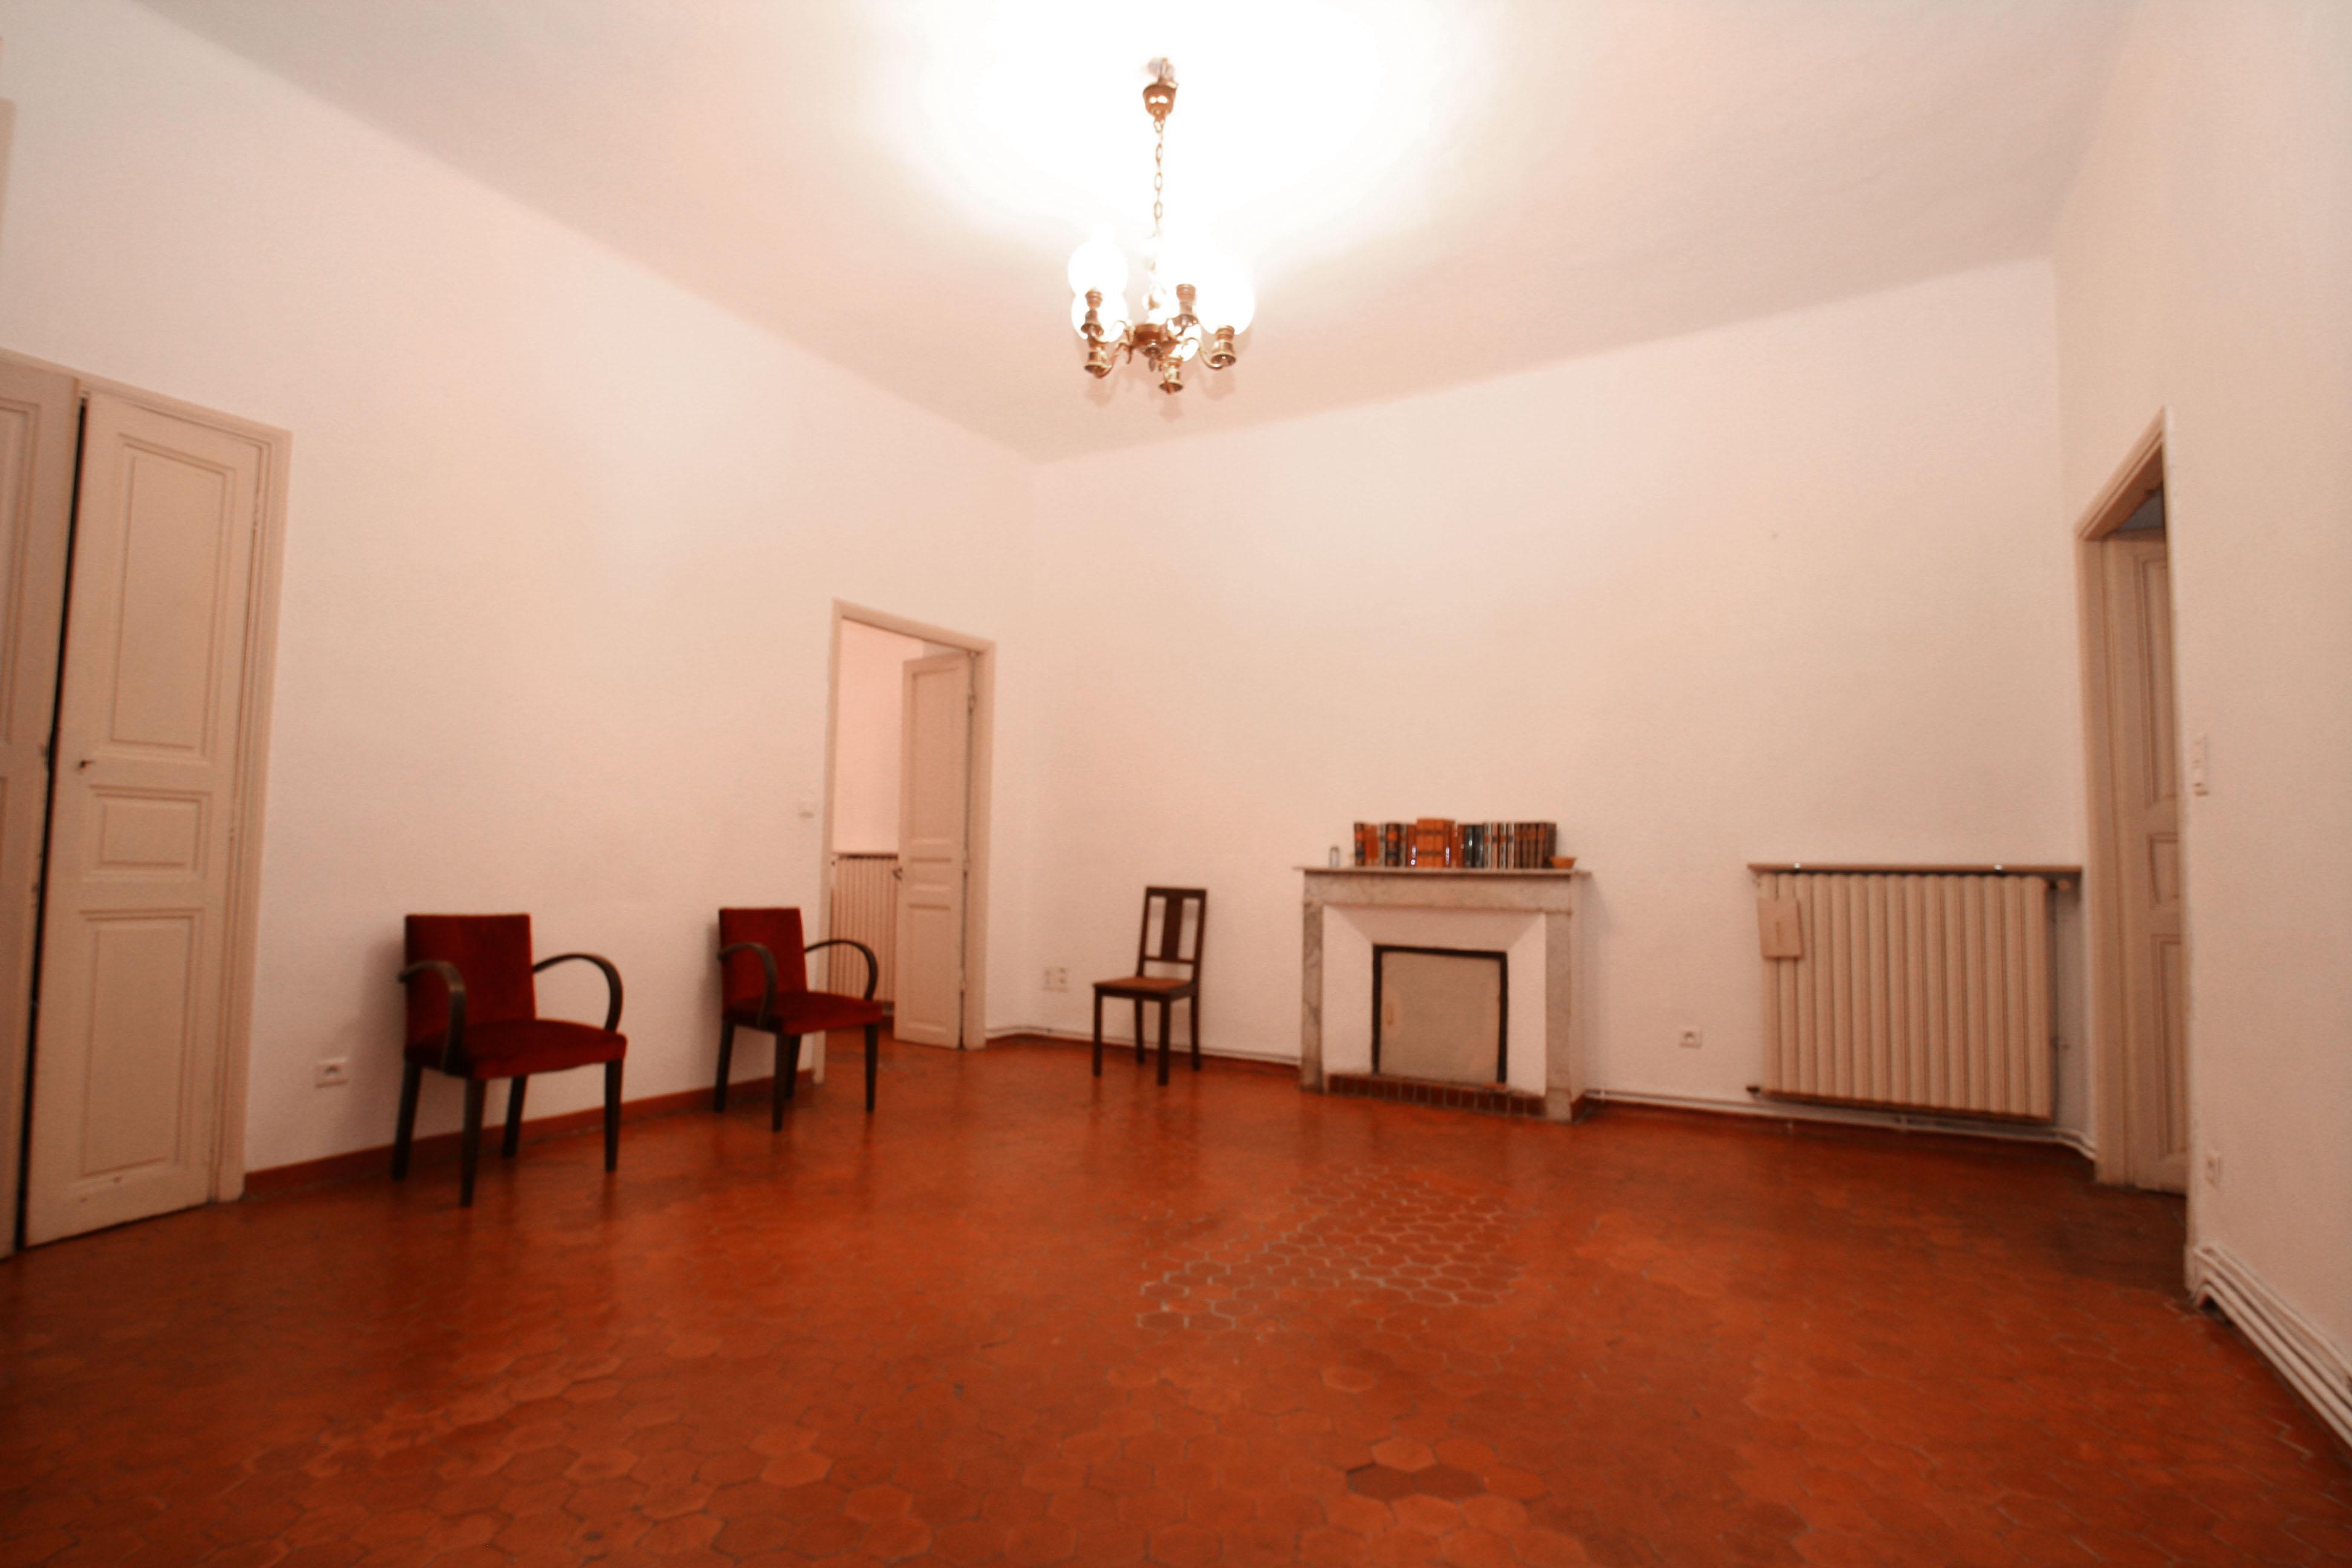 img 3504 agence immobili re bastia avec localisimmo agence immobili re bastia avec localisimmo. Black Bedroom Furniture Sets. Home Design Ideas